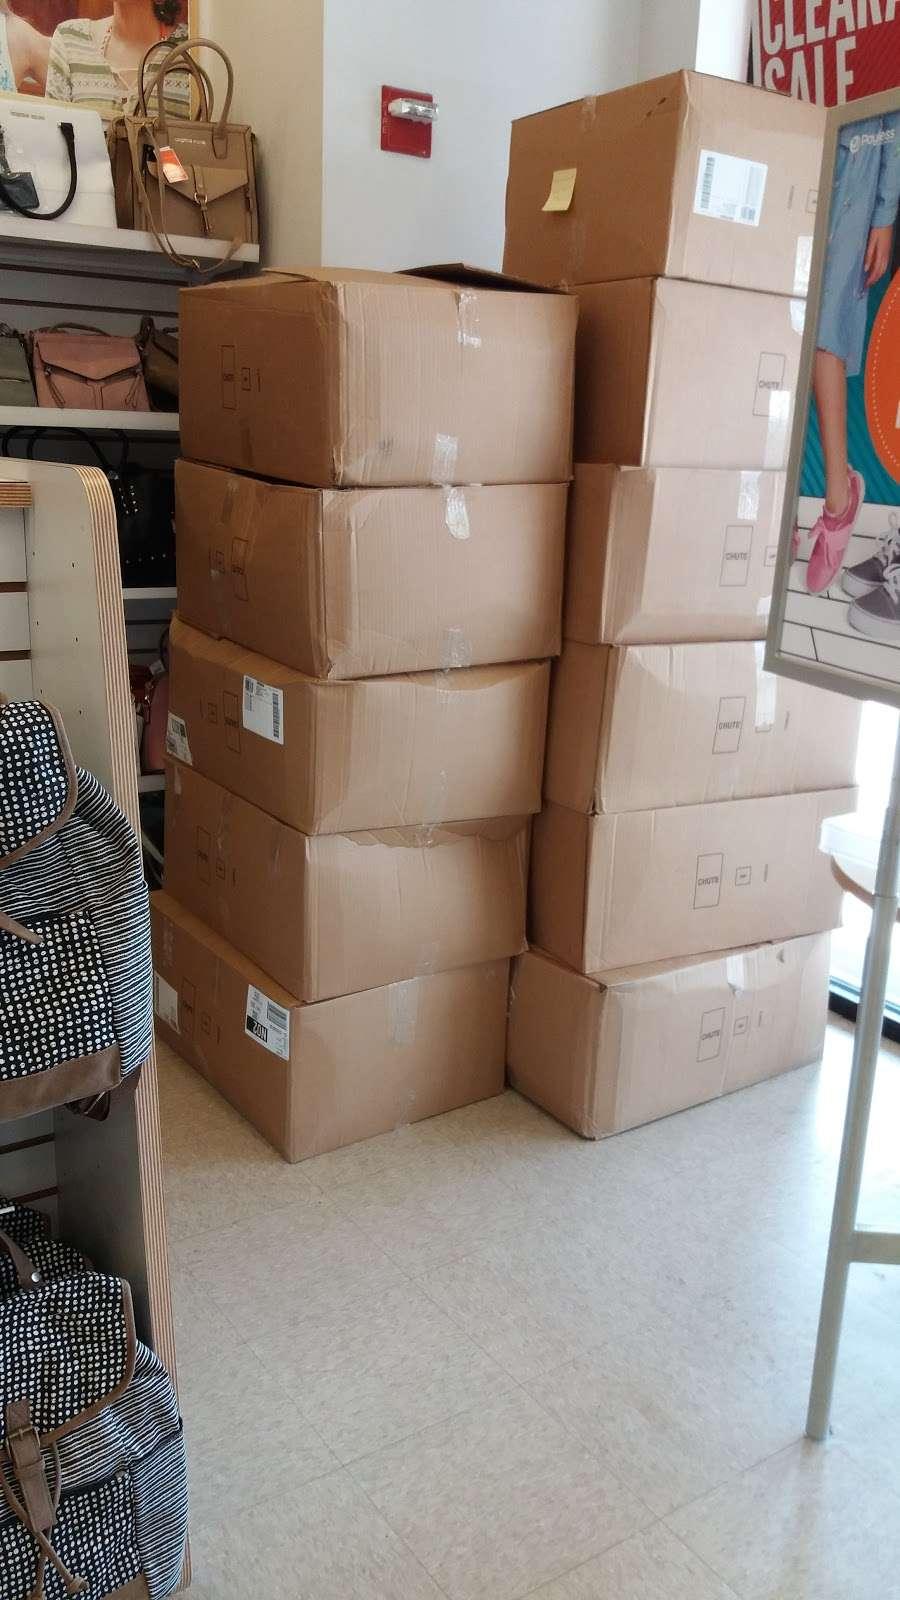 Payless ShoeSource - shoe store  | Photo 5 of 5 | Address: 2260 Bartow Ave, Bronx, NY 10475, USA | Phone: (718) 379-5894